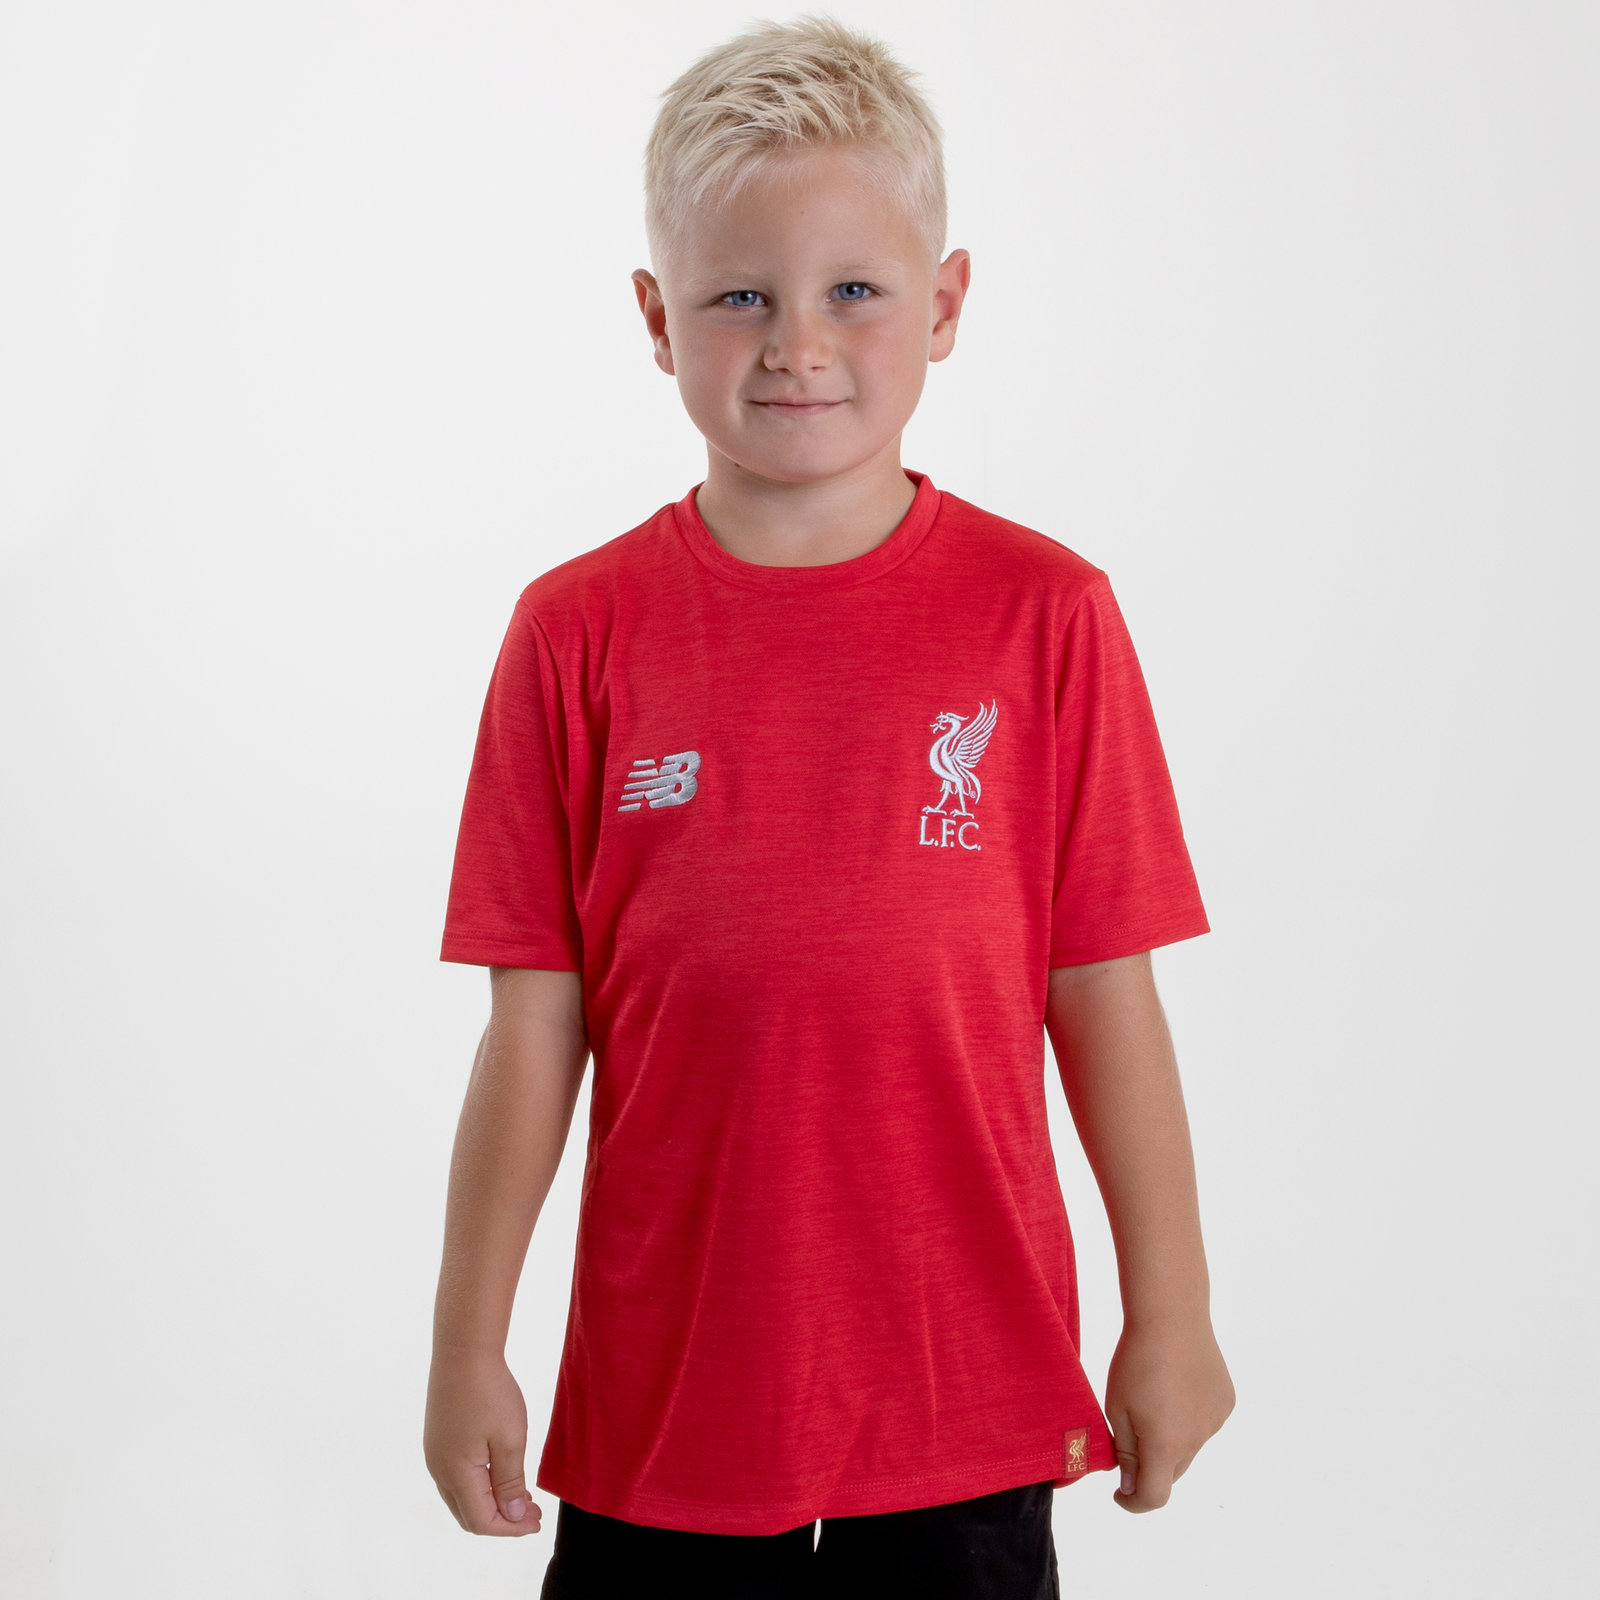 NEW Balance Liverpool FC 18//19 Kids Football Training T-shirt SPORTS Top